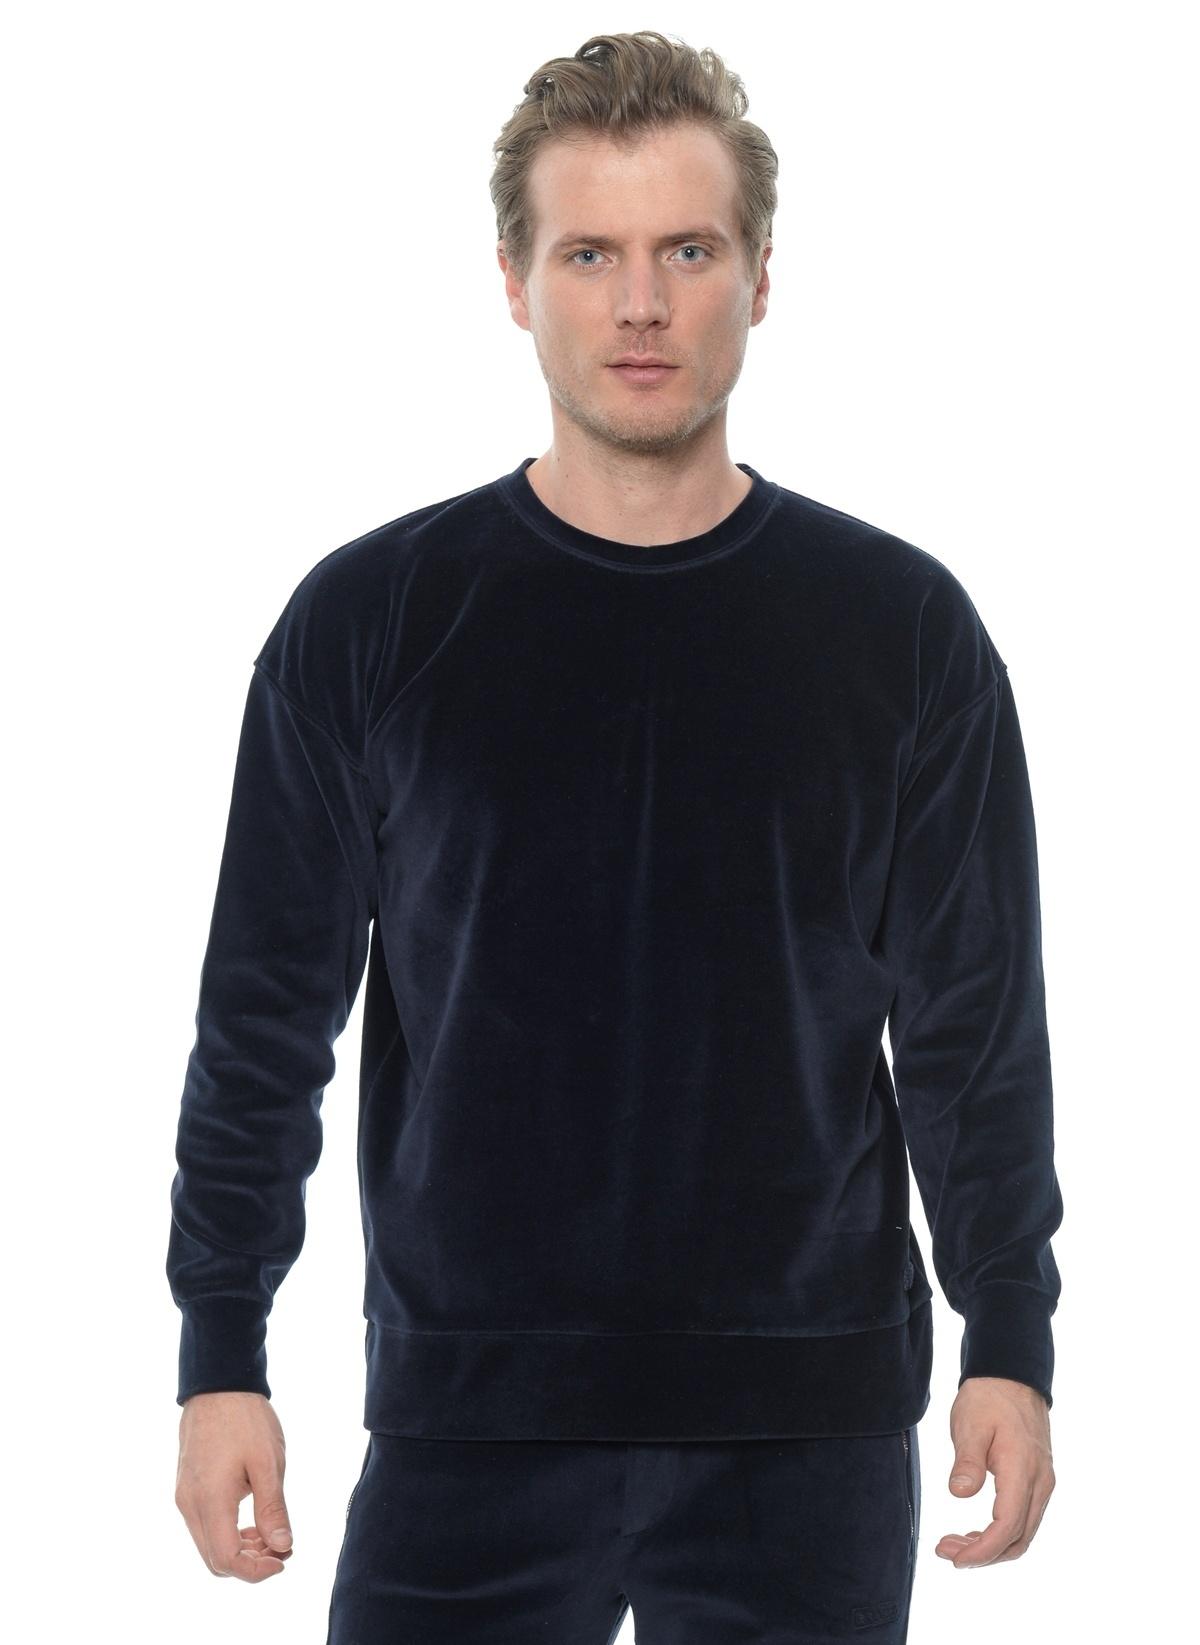 Braez Sweatshirt 5002005fw1816 Catcher Sweat Shırt – 272.5 TL